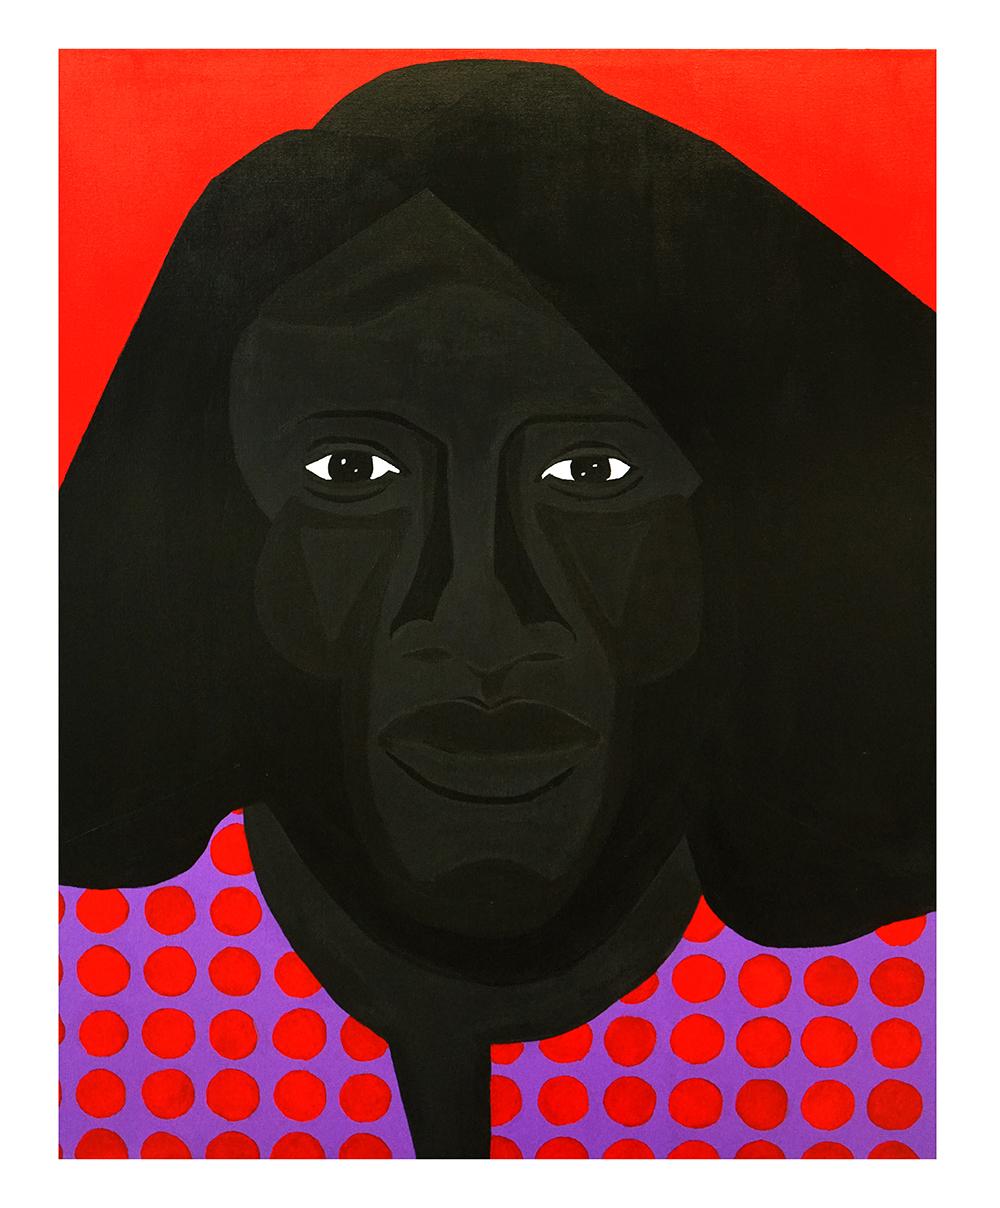 Jon Key. <em>Family Portrait No. 3 (Linda)</em>, 2020. Acrylic on canvas, 40 x 30 inches (101.6 x 76.2 cm)